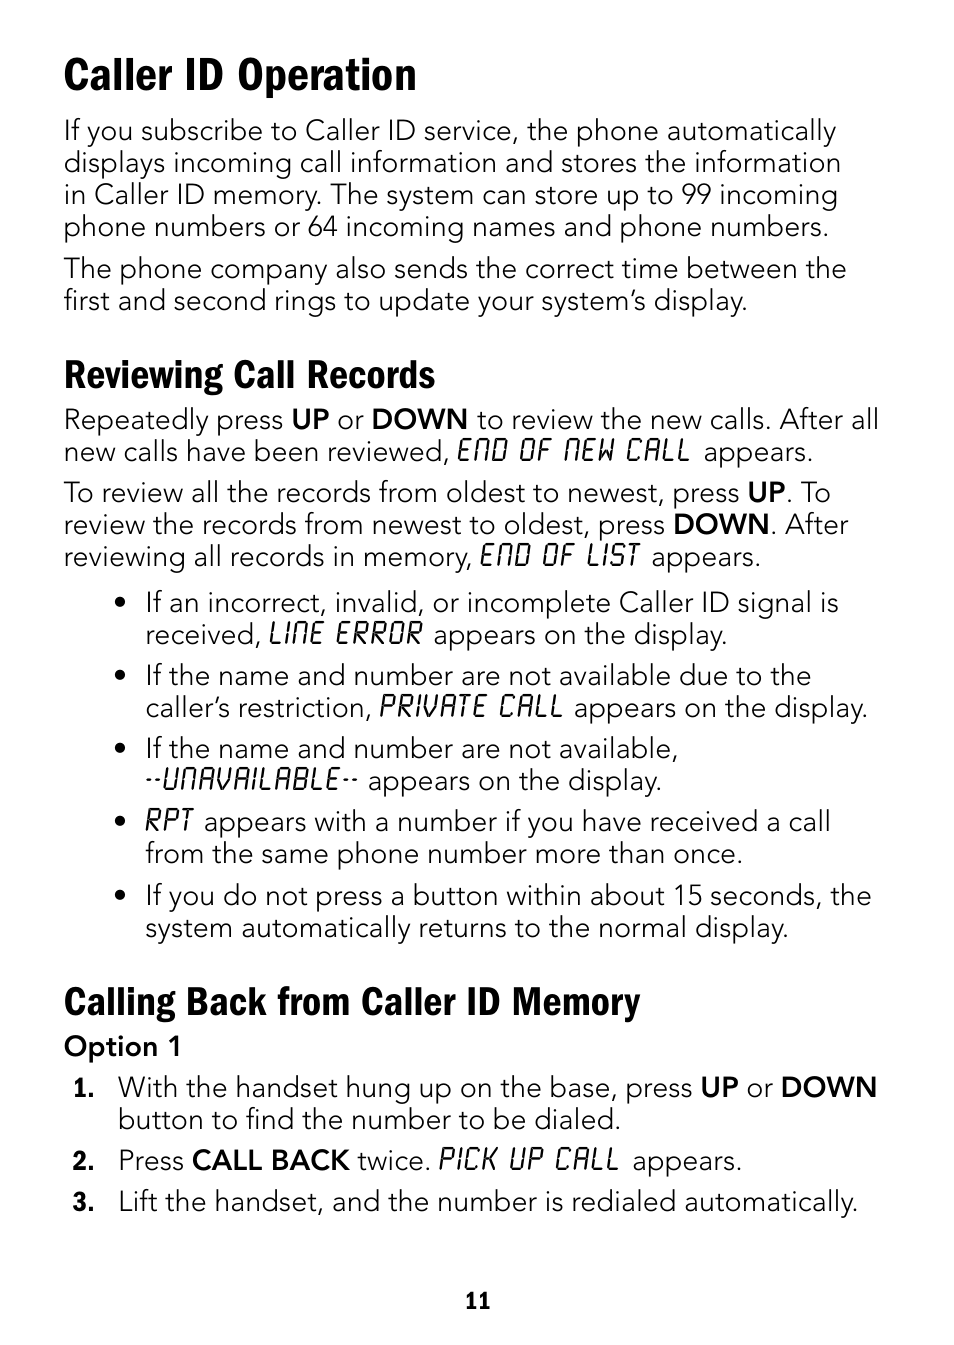 caller id operation reviewing call records radio shack 43 3901 rh manualsdir com